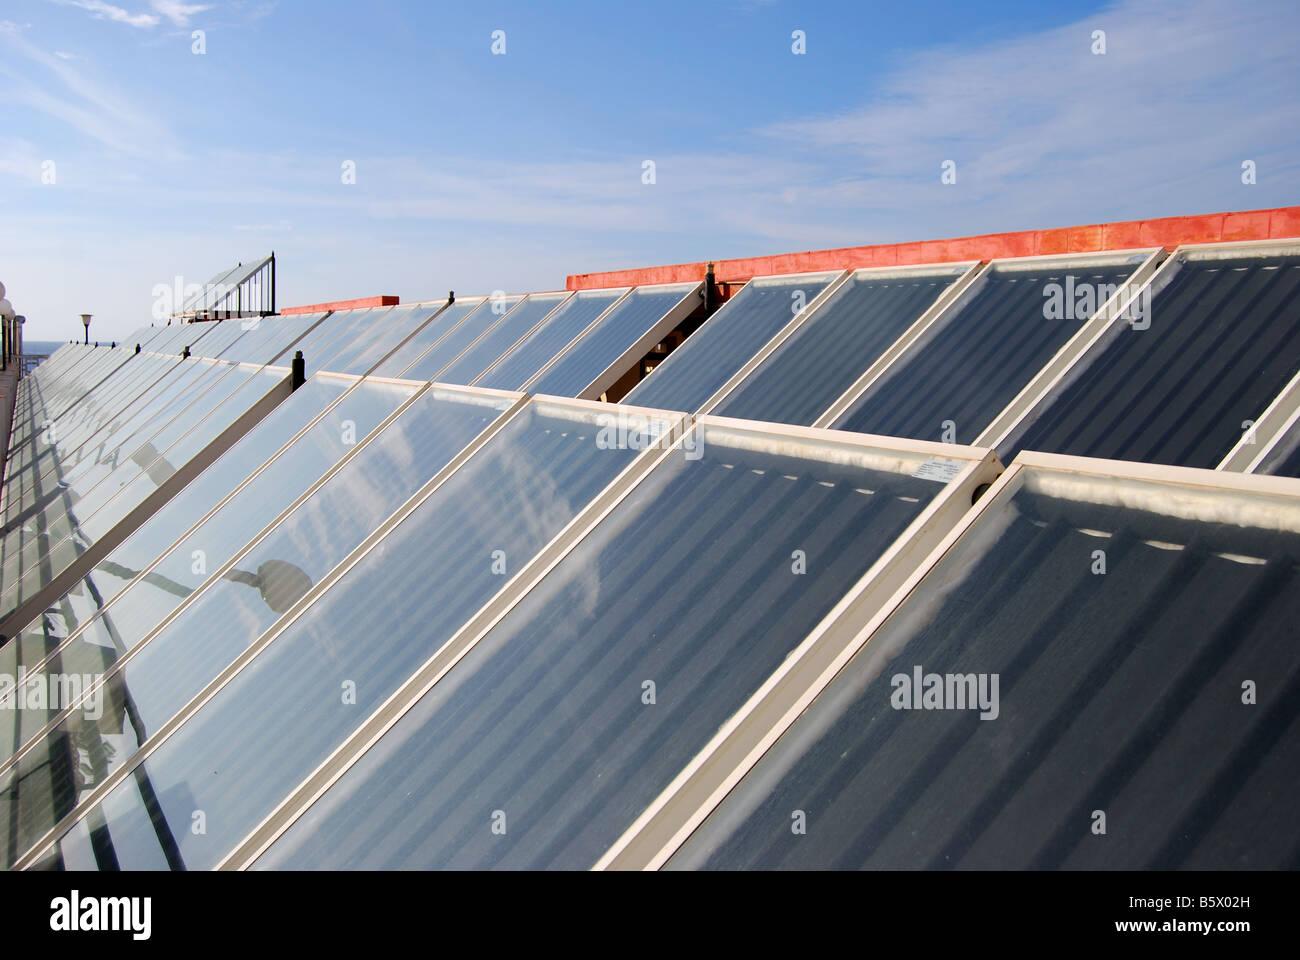 Hotel solar panels, Puerto de La Cruz, Tenerife, Canary Islands, Spain - Stock Image